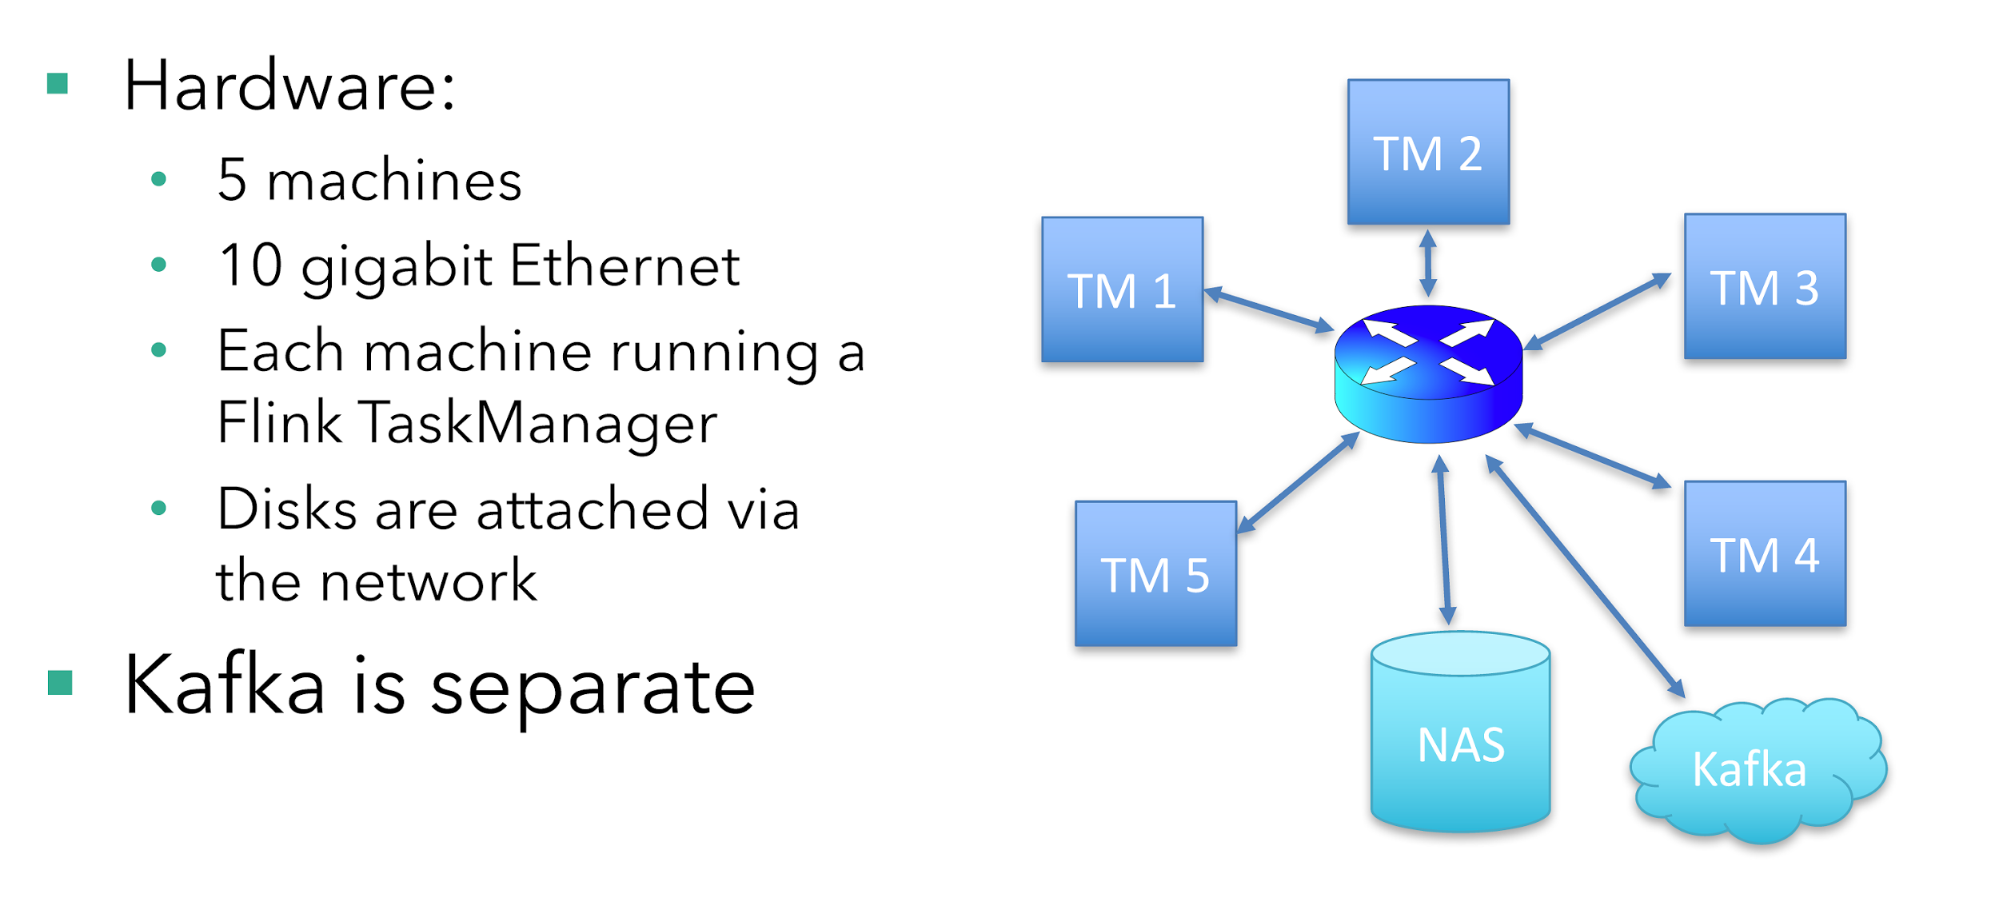 Hardware in example Apache Flink cluster